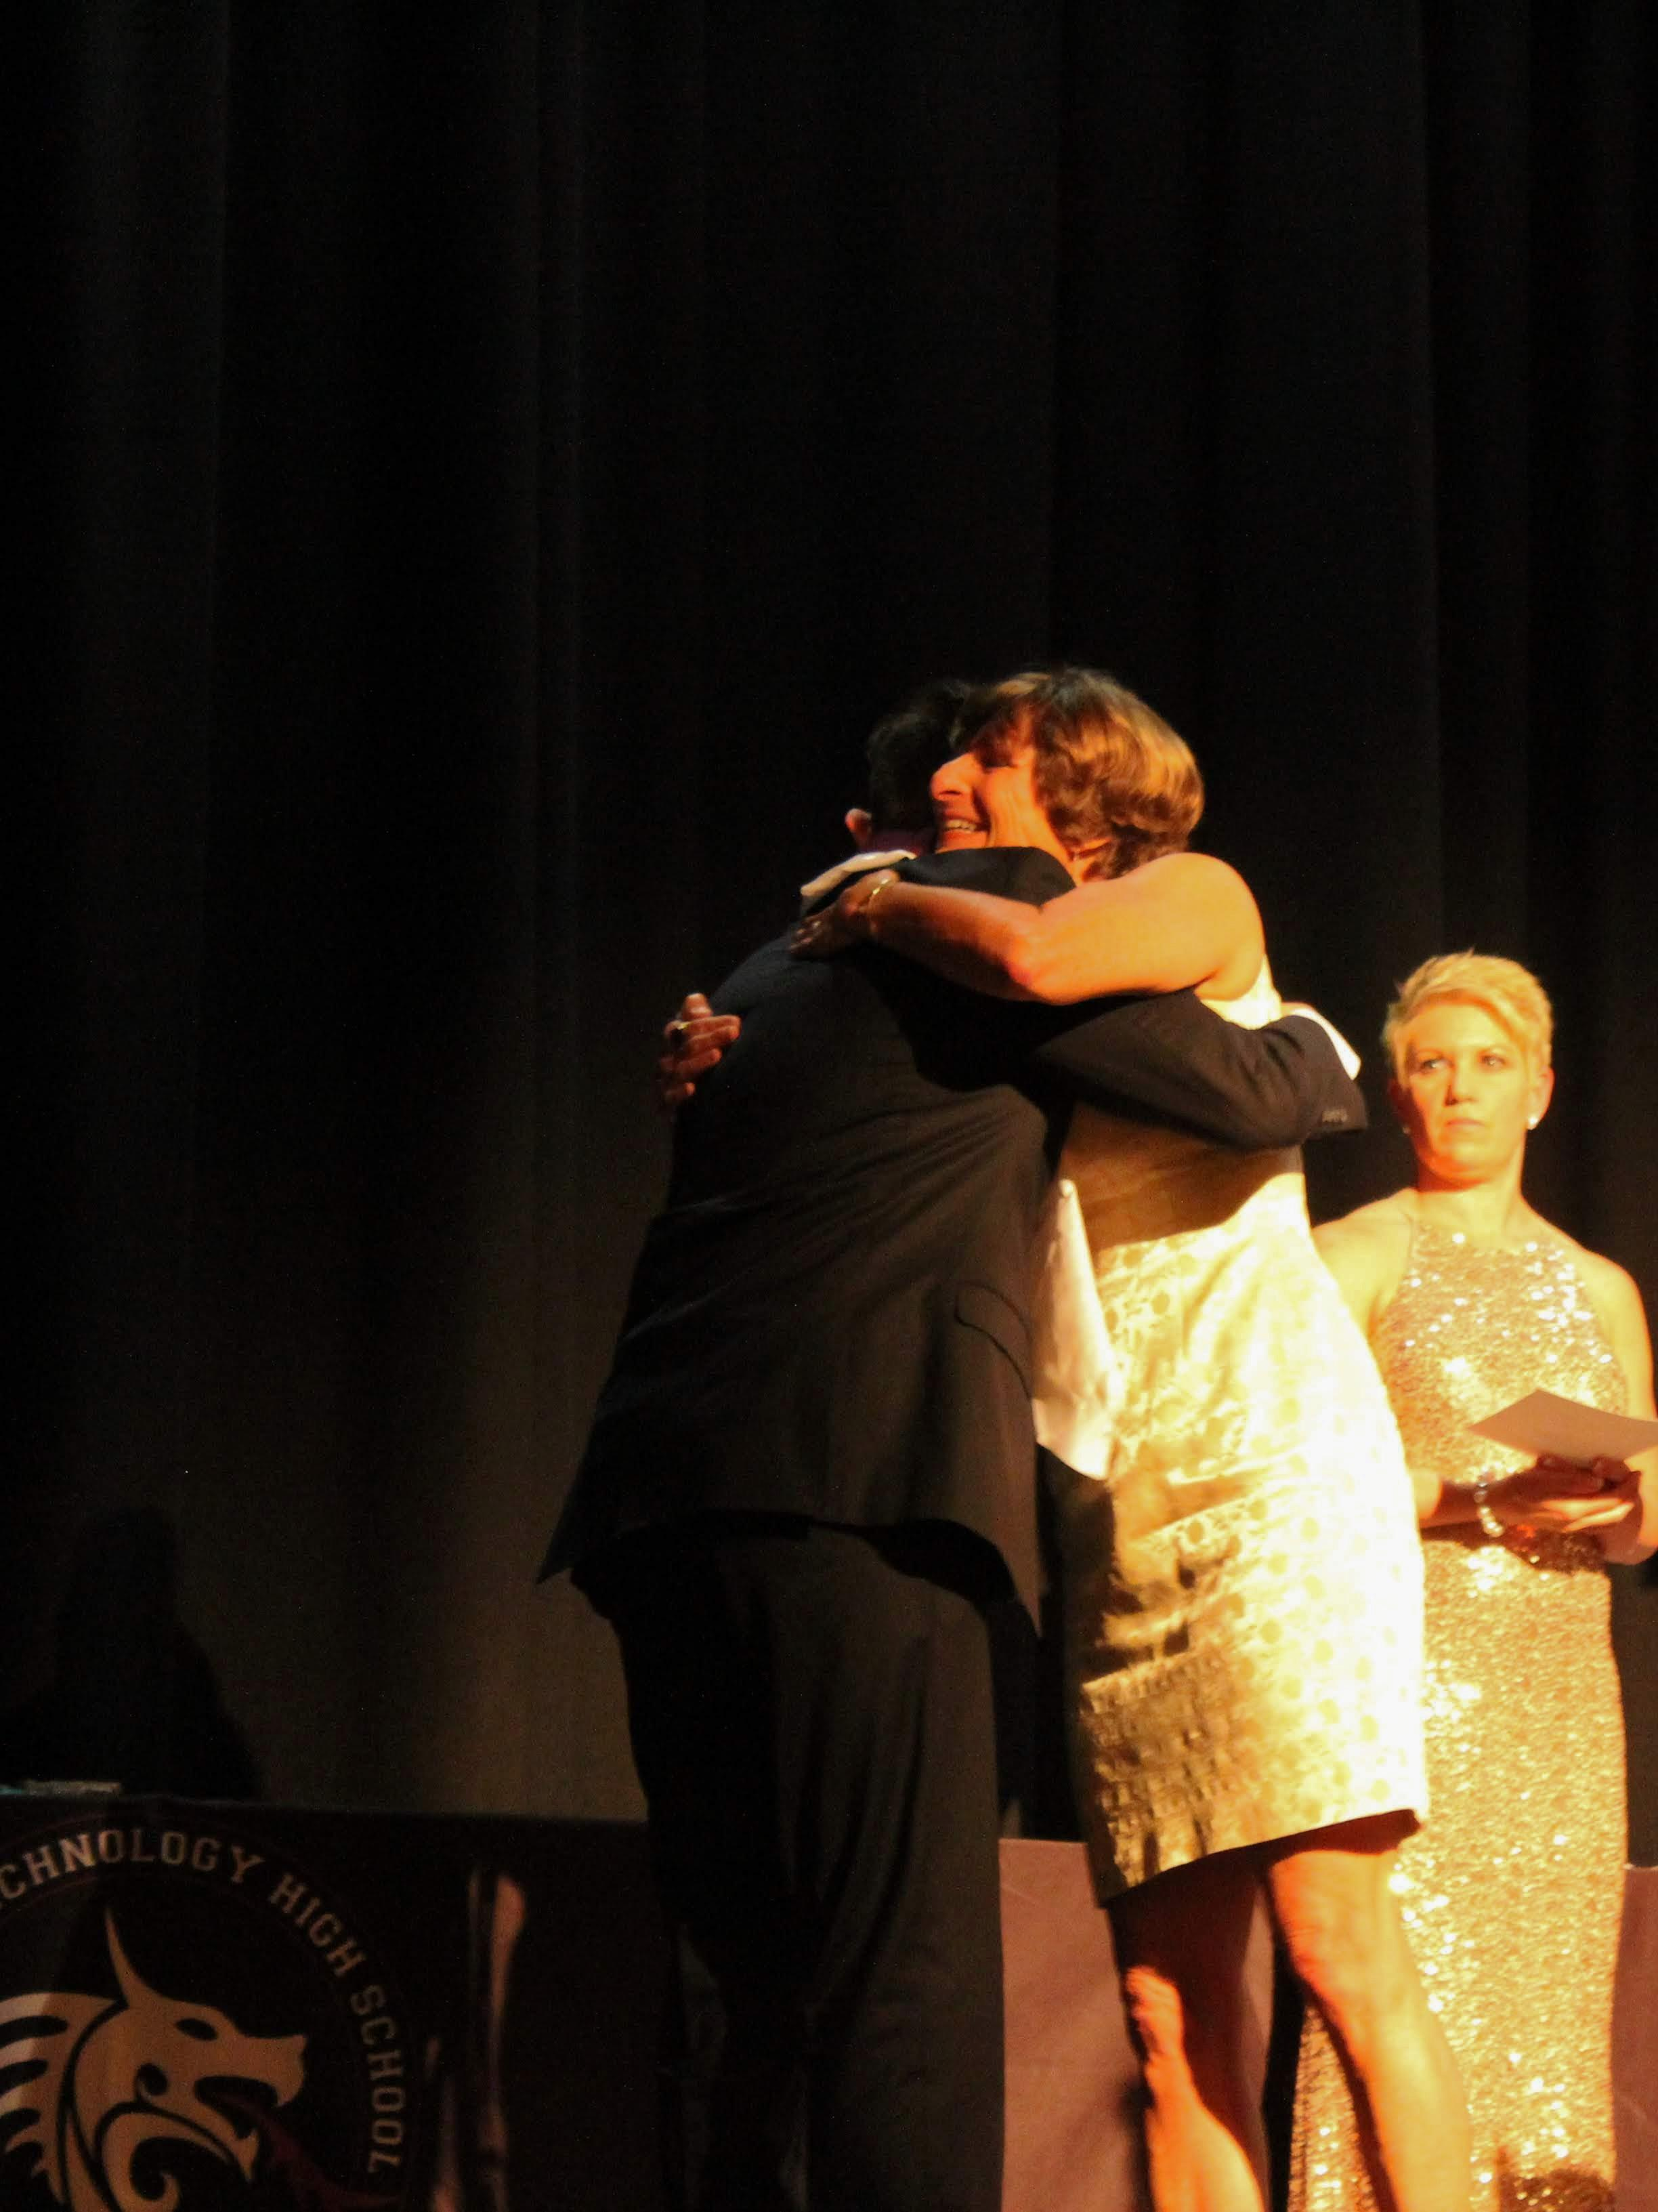 Cherie Eulau congratulates an award winner with a hug. Credit: Quinn Dinkler / The Foothill Dragon Press